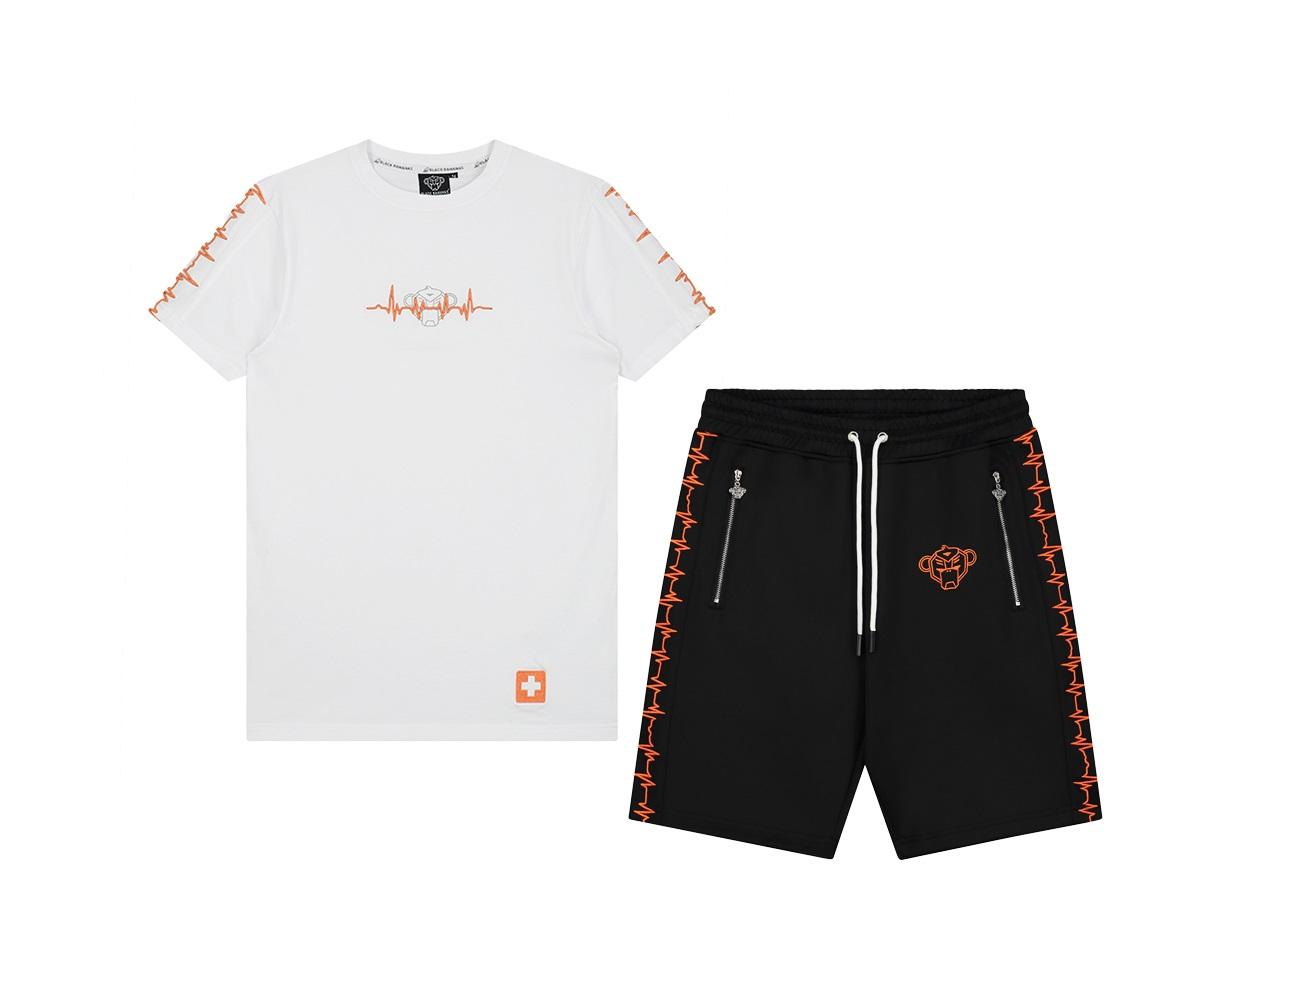 Lifelong-set-black-orange-white